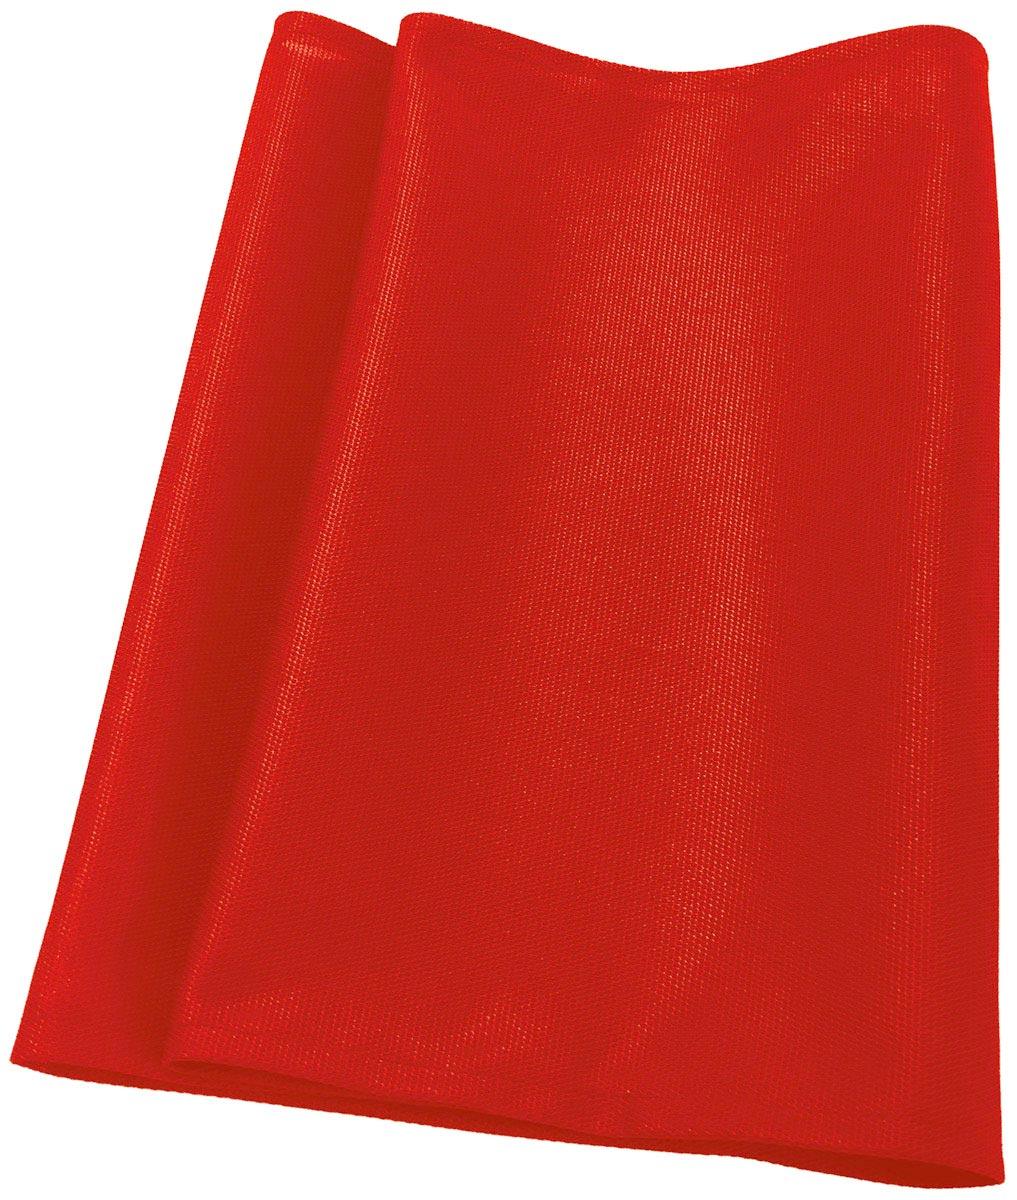 Filterüberzug IDEAL AP30/40 - Rot